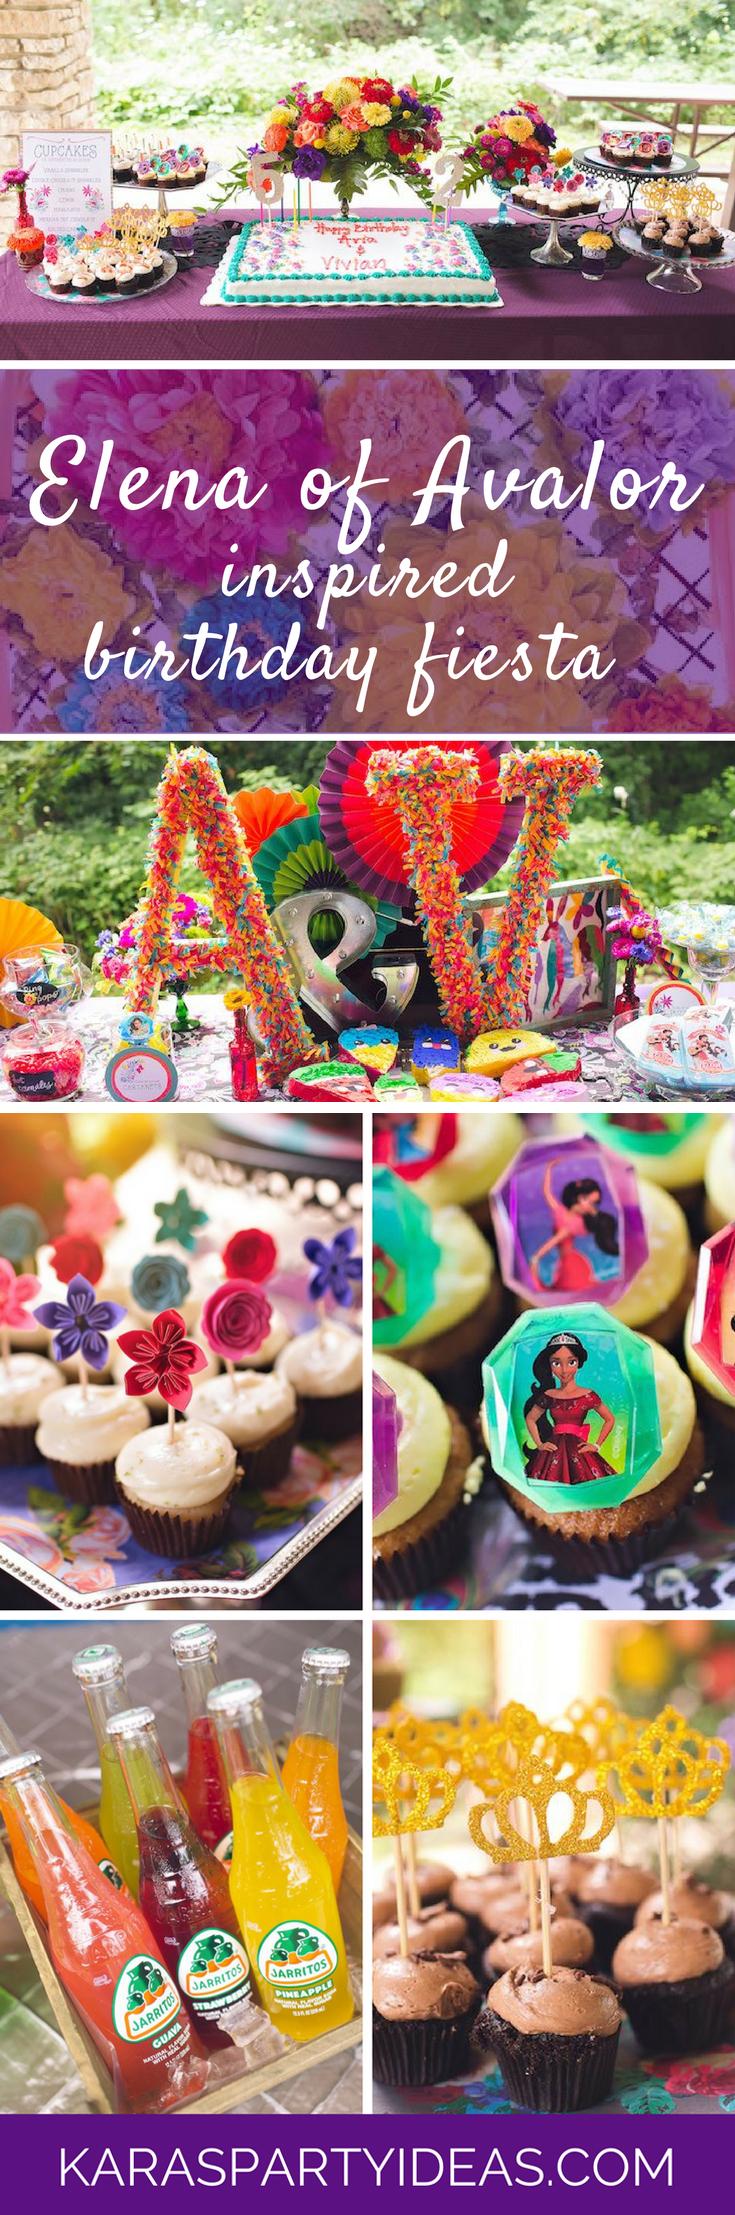 Elena of Avalor Inspired Birthday Fiesta via Kara's Party Ideas - KarasPartyIdeas.com